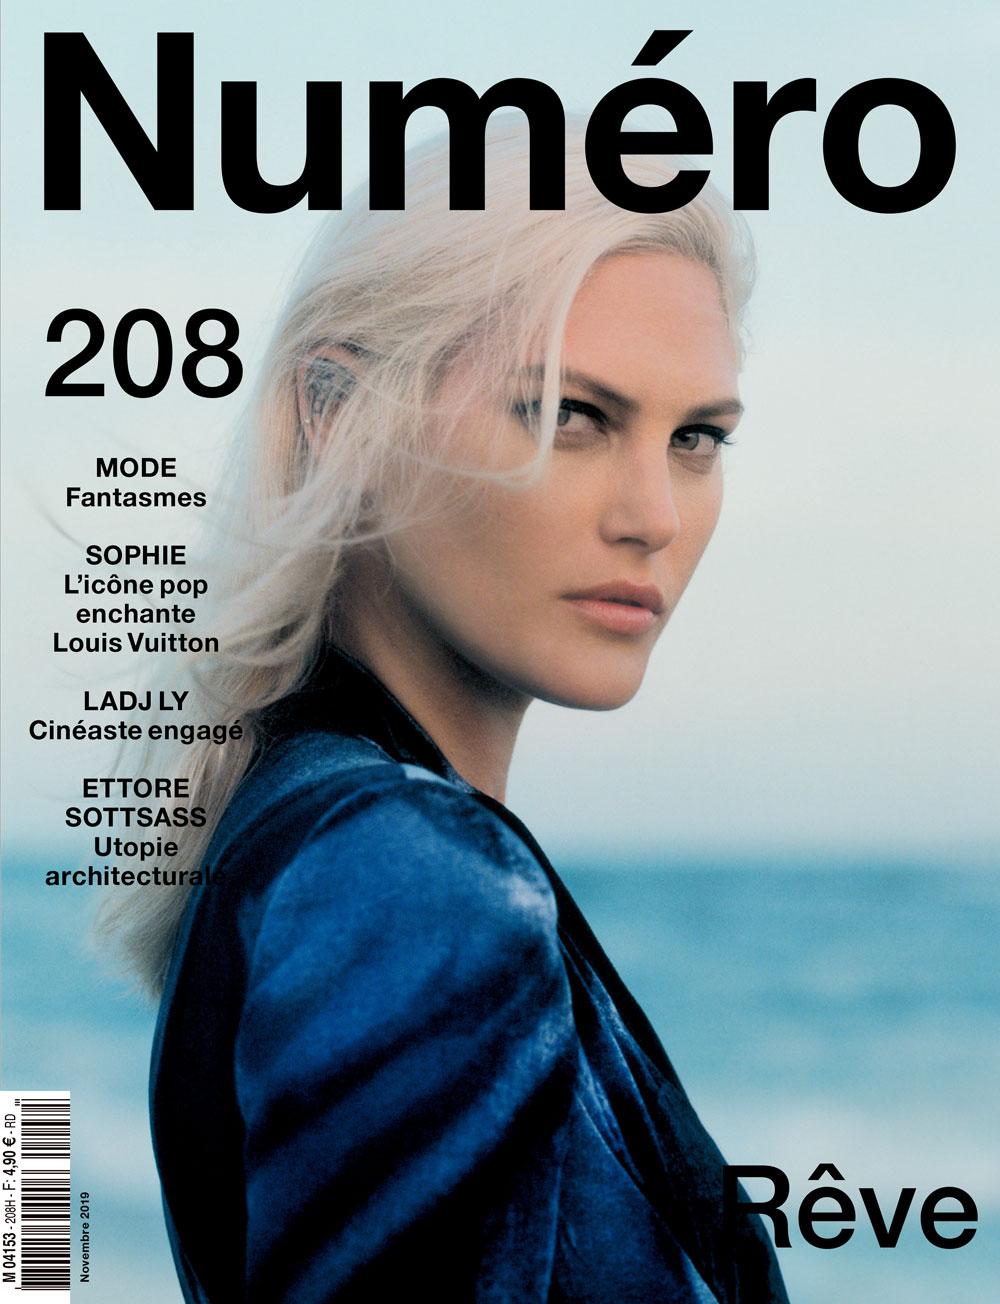 Numero-208-cover-ALEXANDER-SALADRIGAS